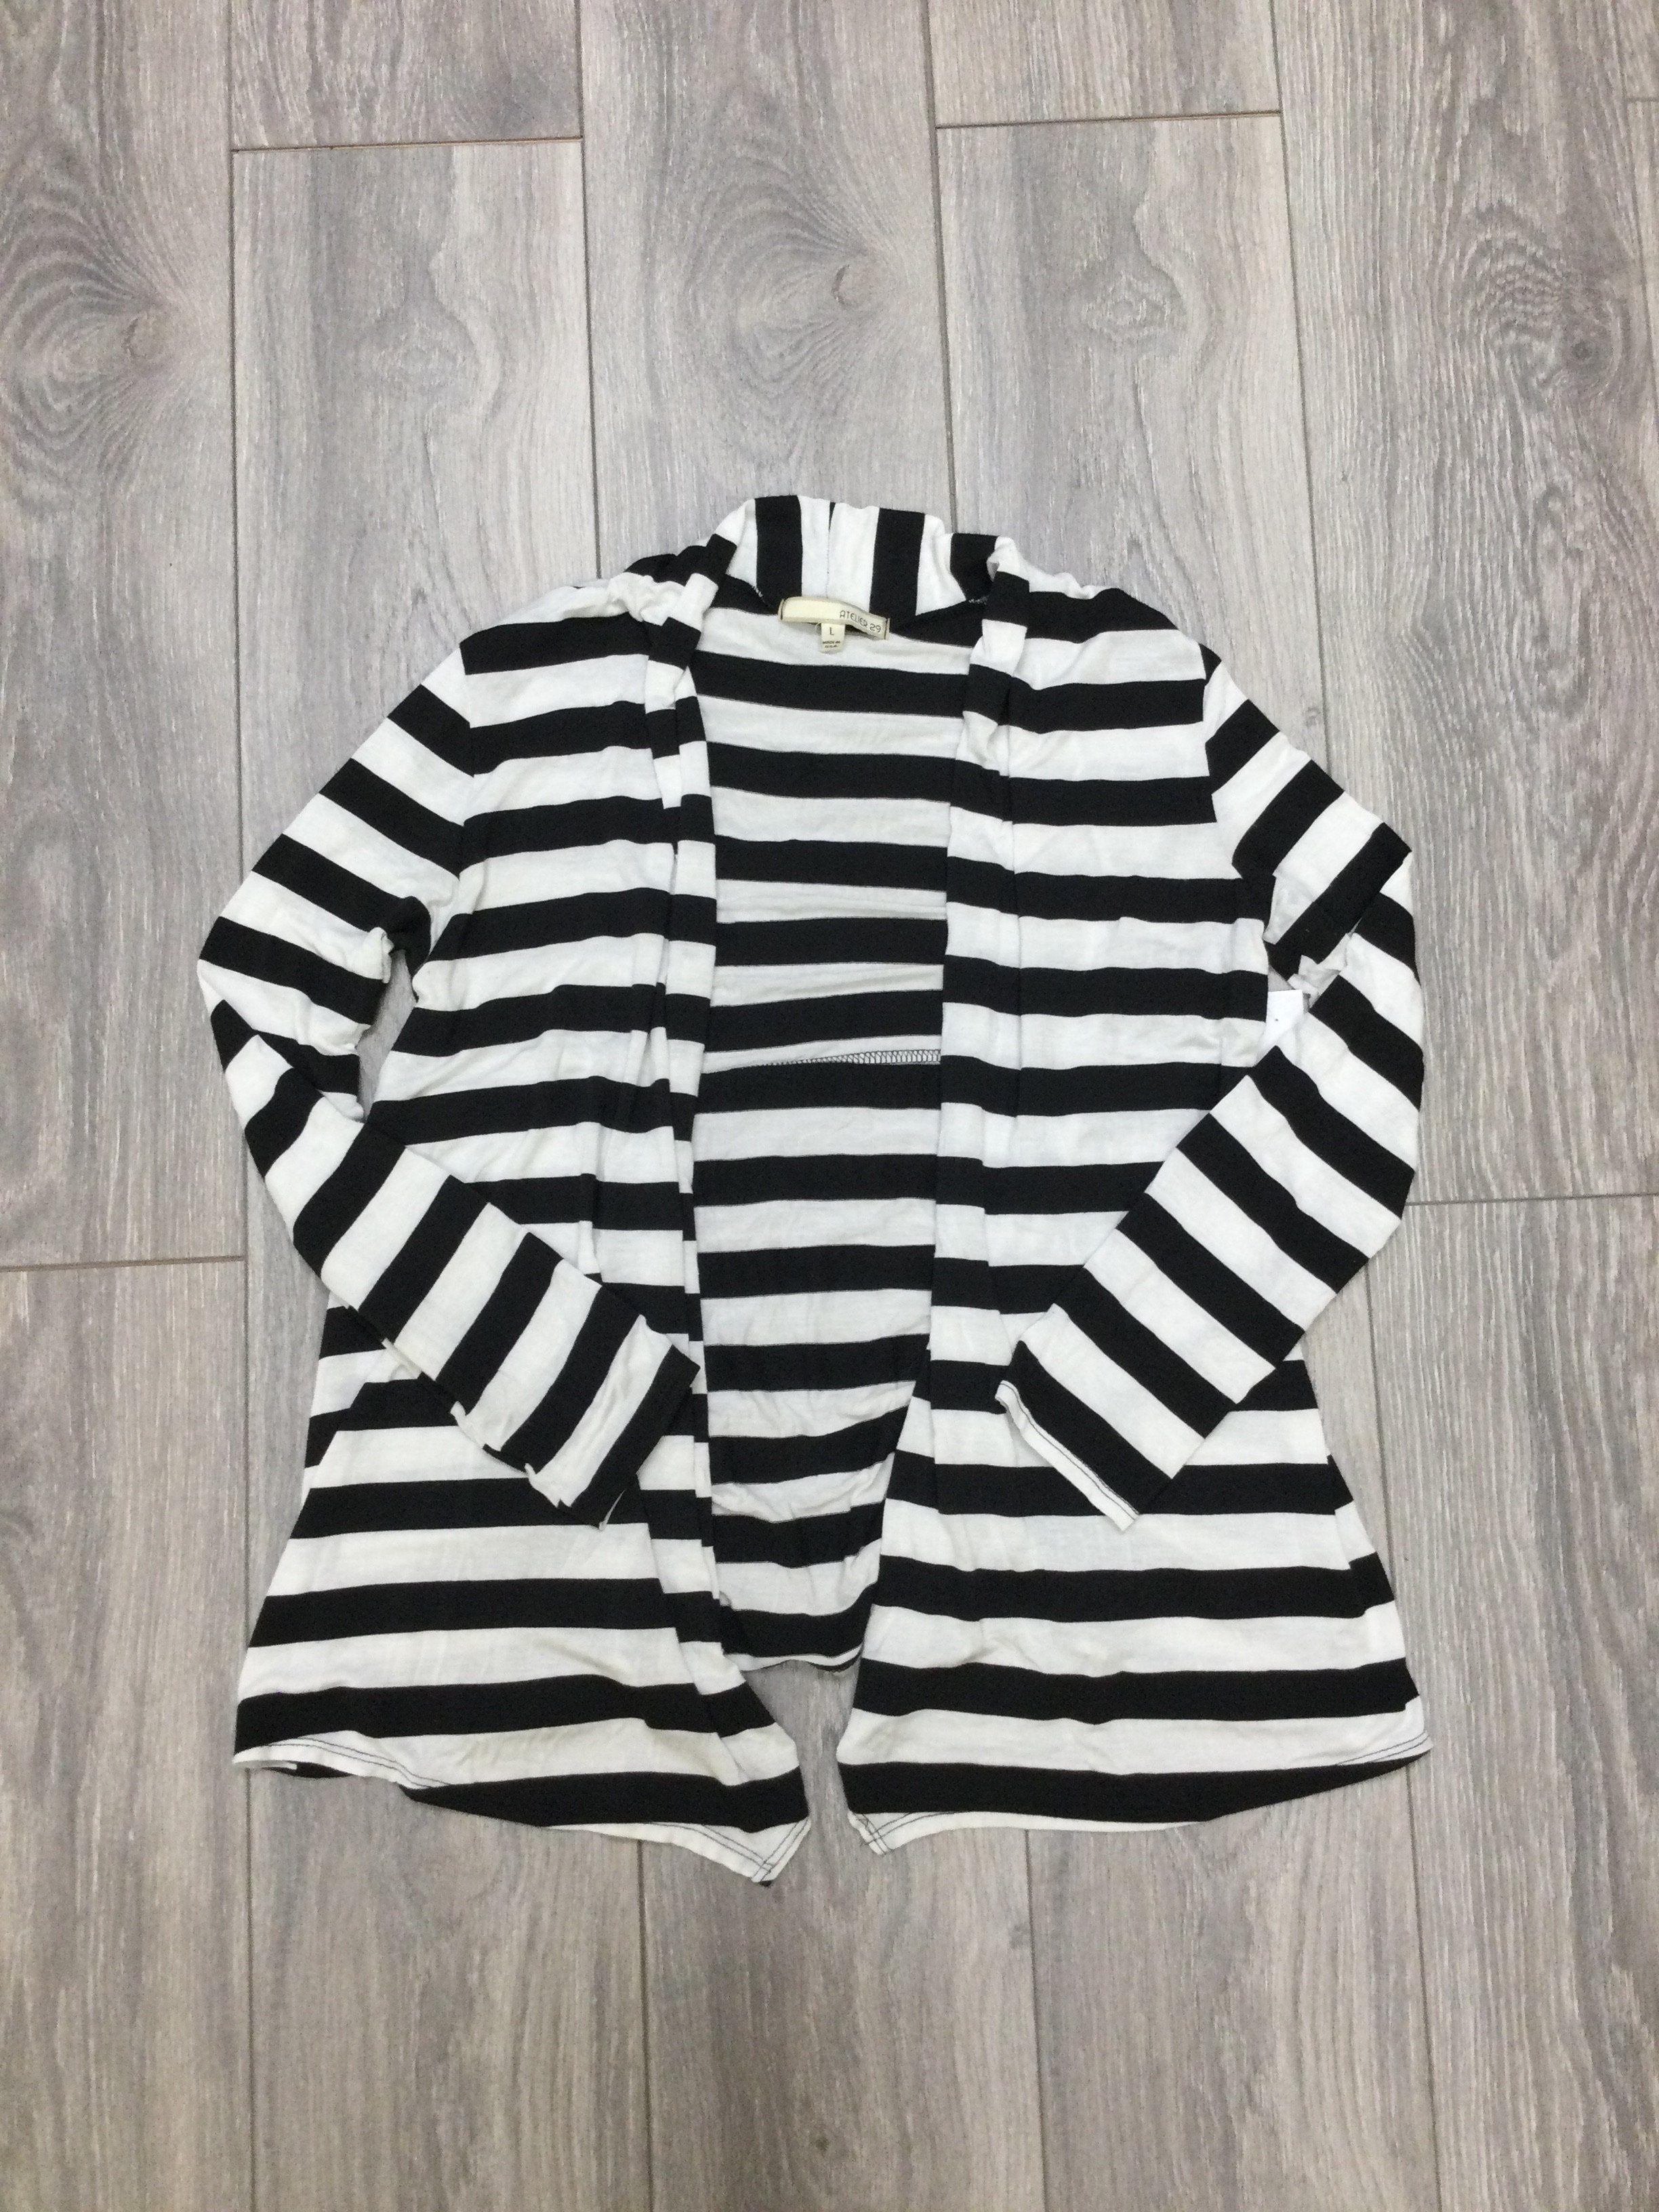 Sweater Cardigan Lightweight By Atelier  Size: L